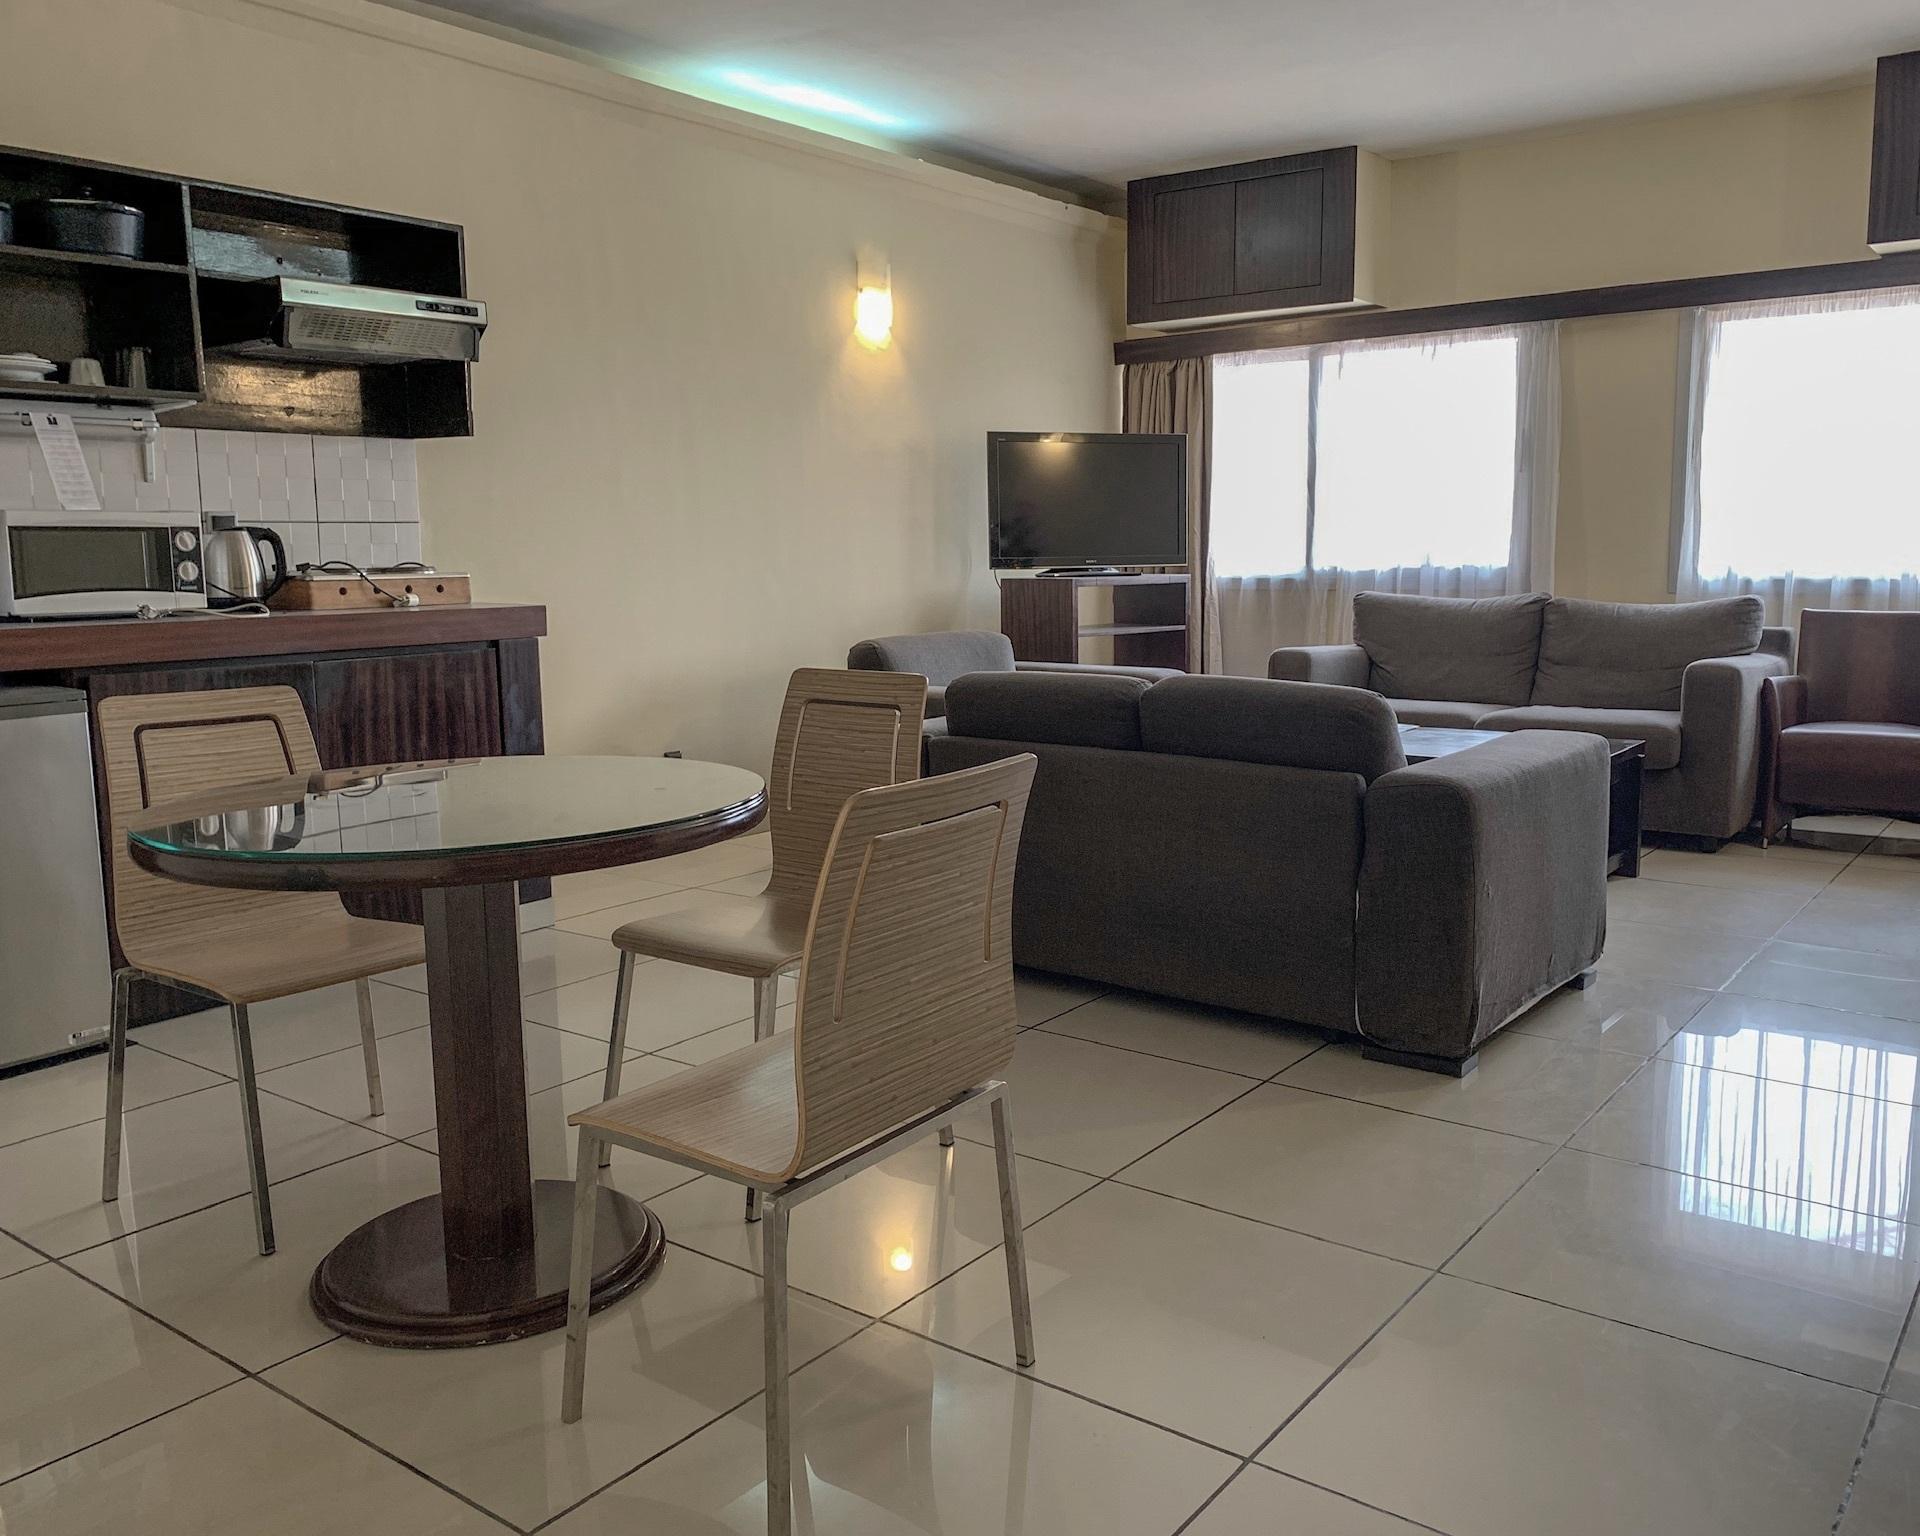 1-Bedroom Apartment - 60 m²